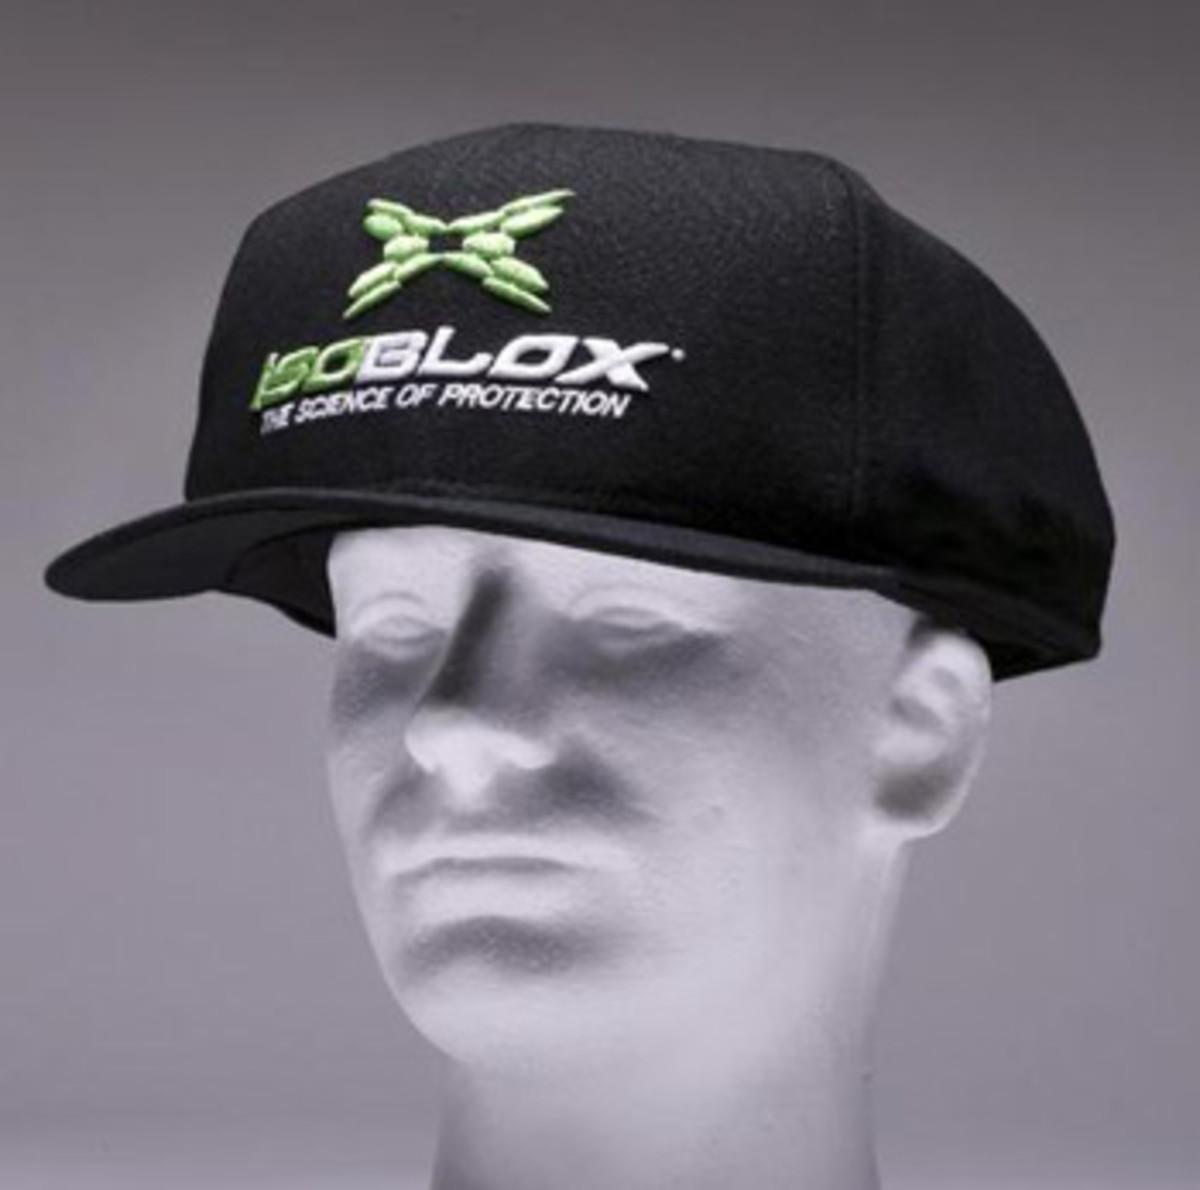 major league baseball pitcher headgear isoblox